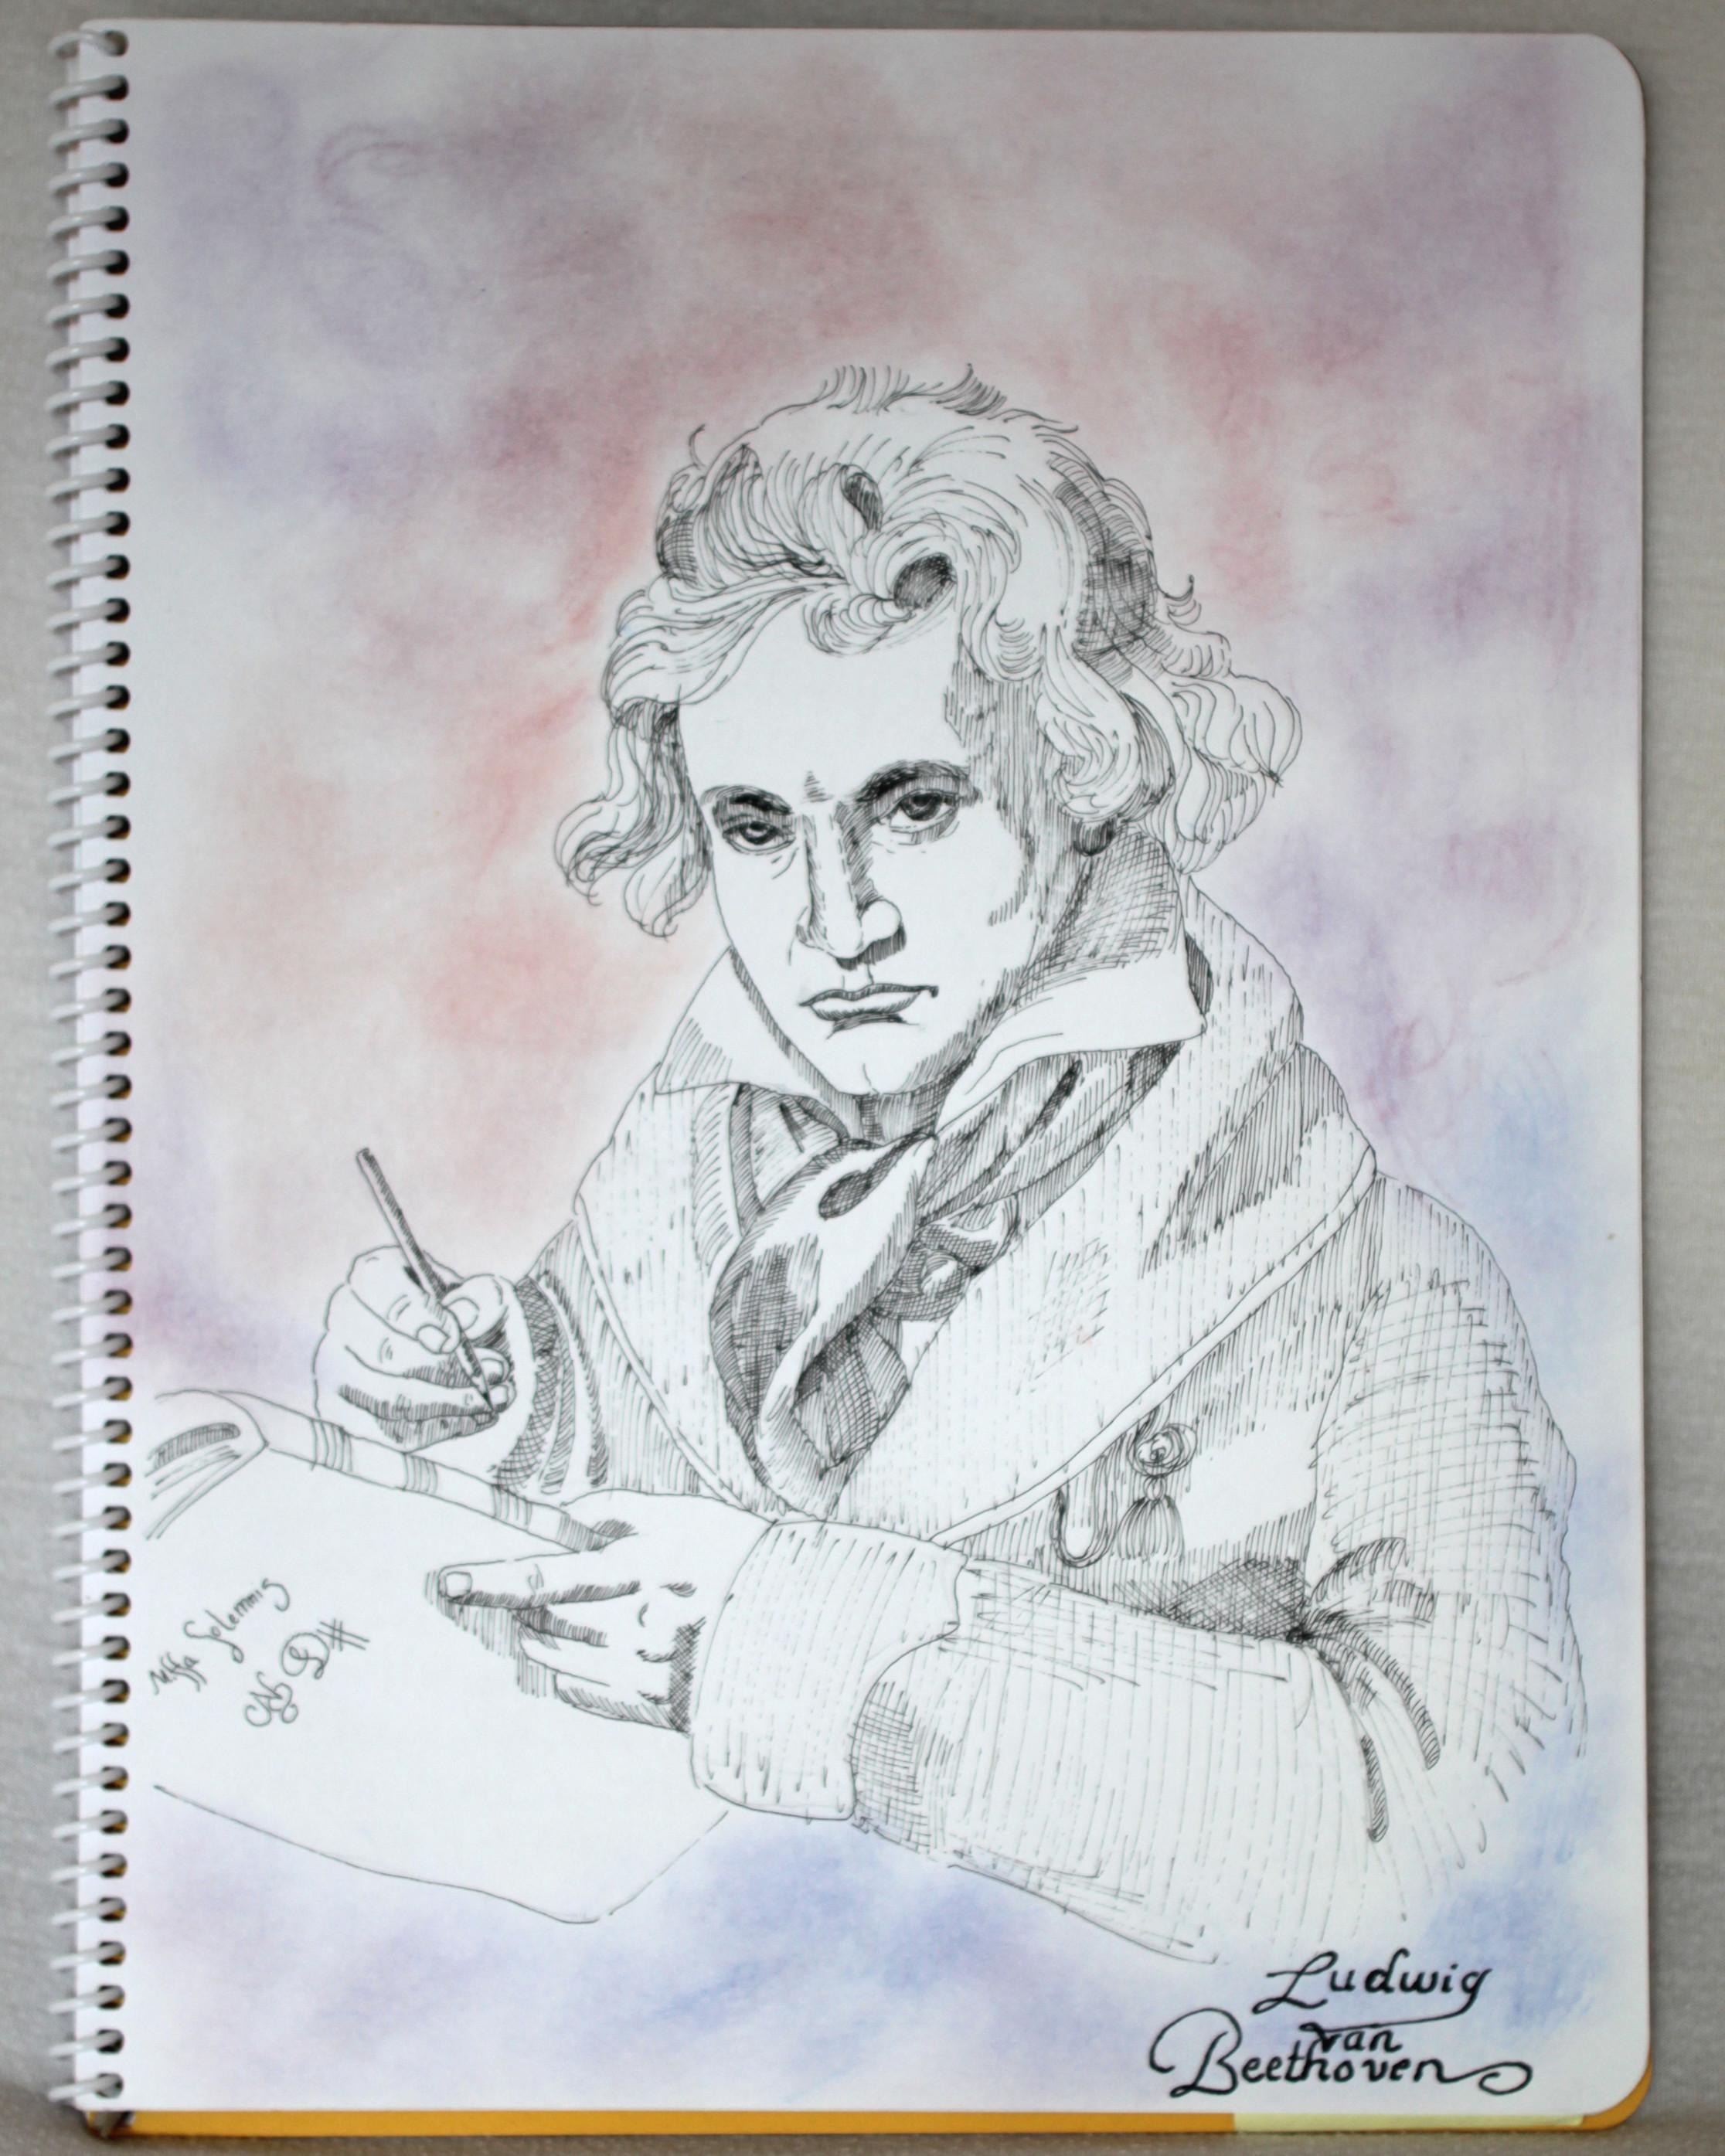 lessonbook-artist-beethoven.jpg